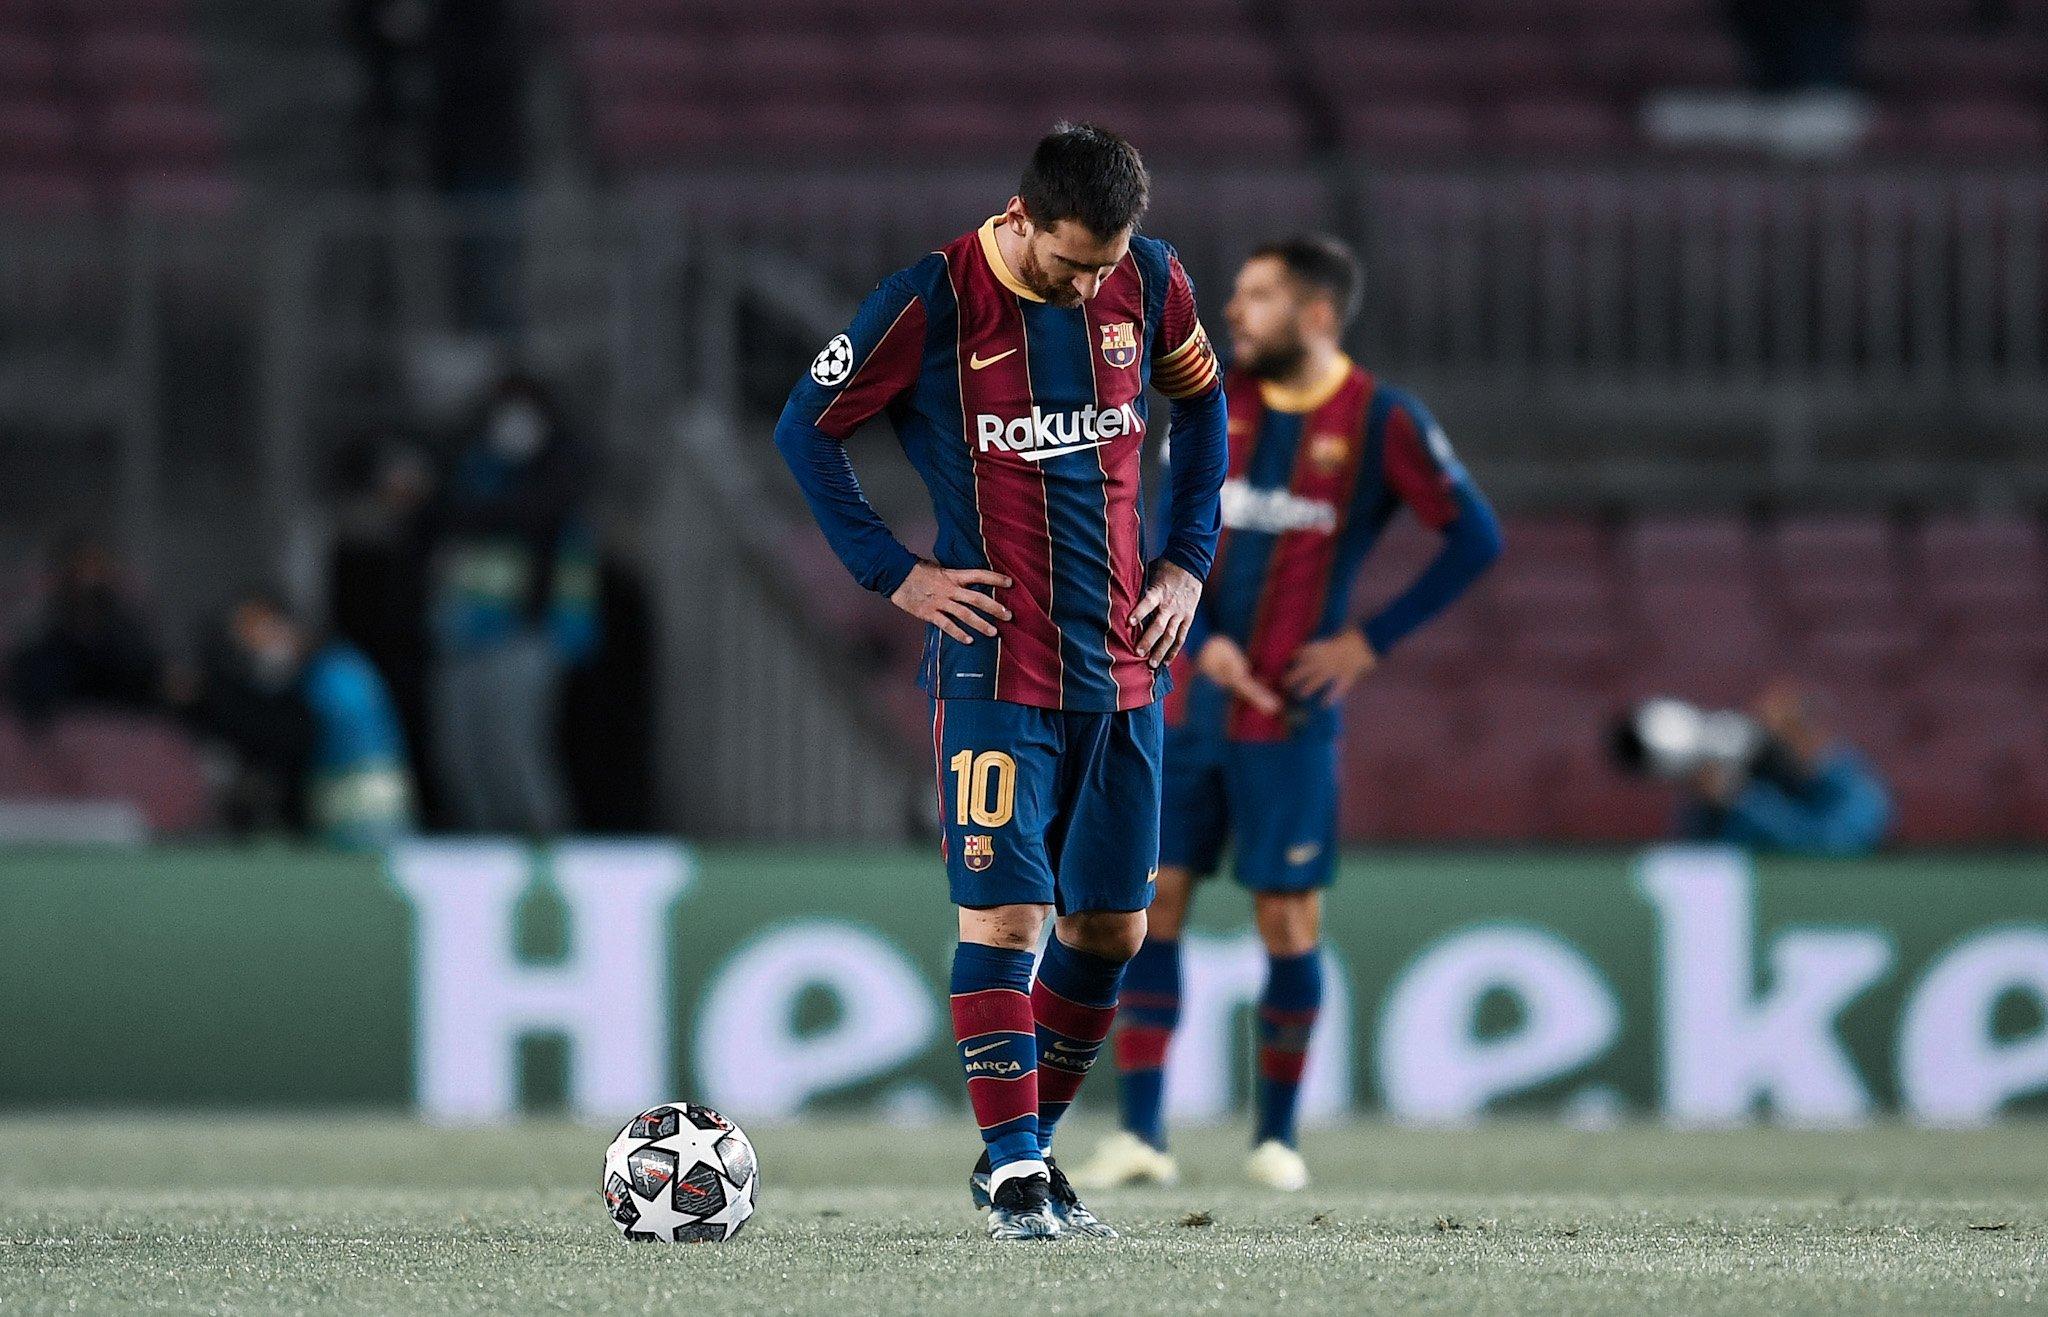 Barcelona 1 4 Psg Match Review Mbappe Hattrick Ends Barca Barca Universal